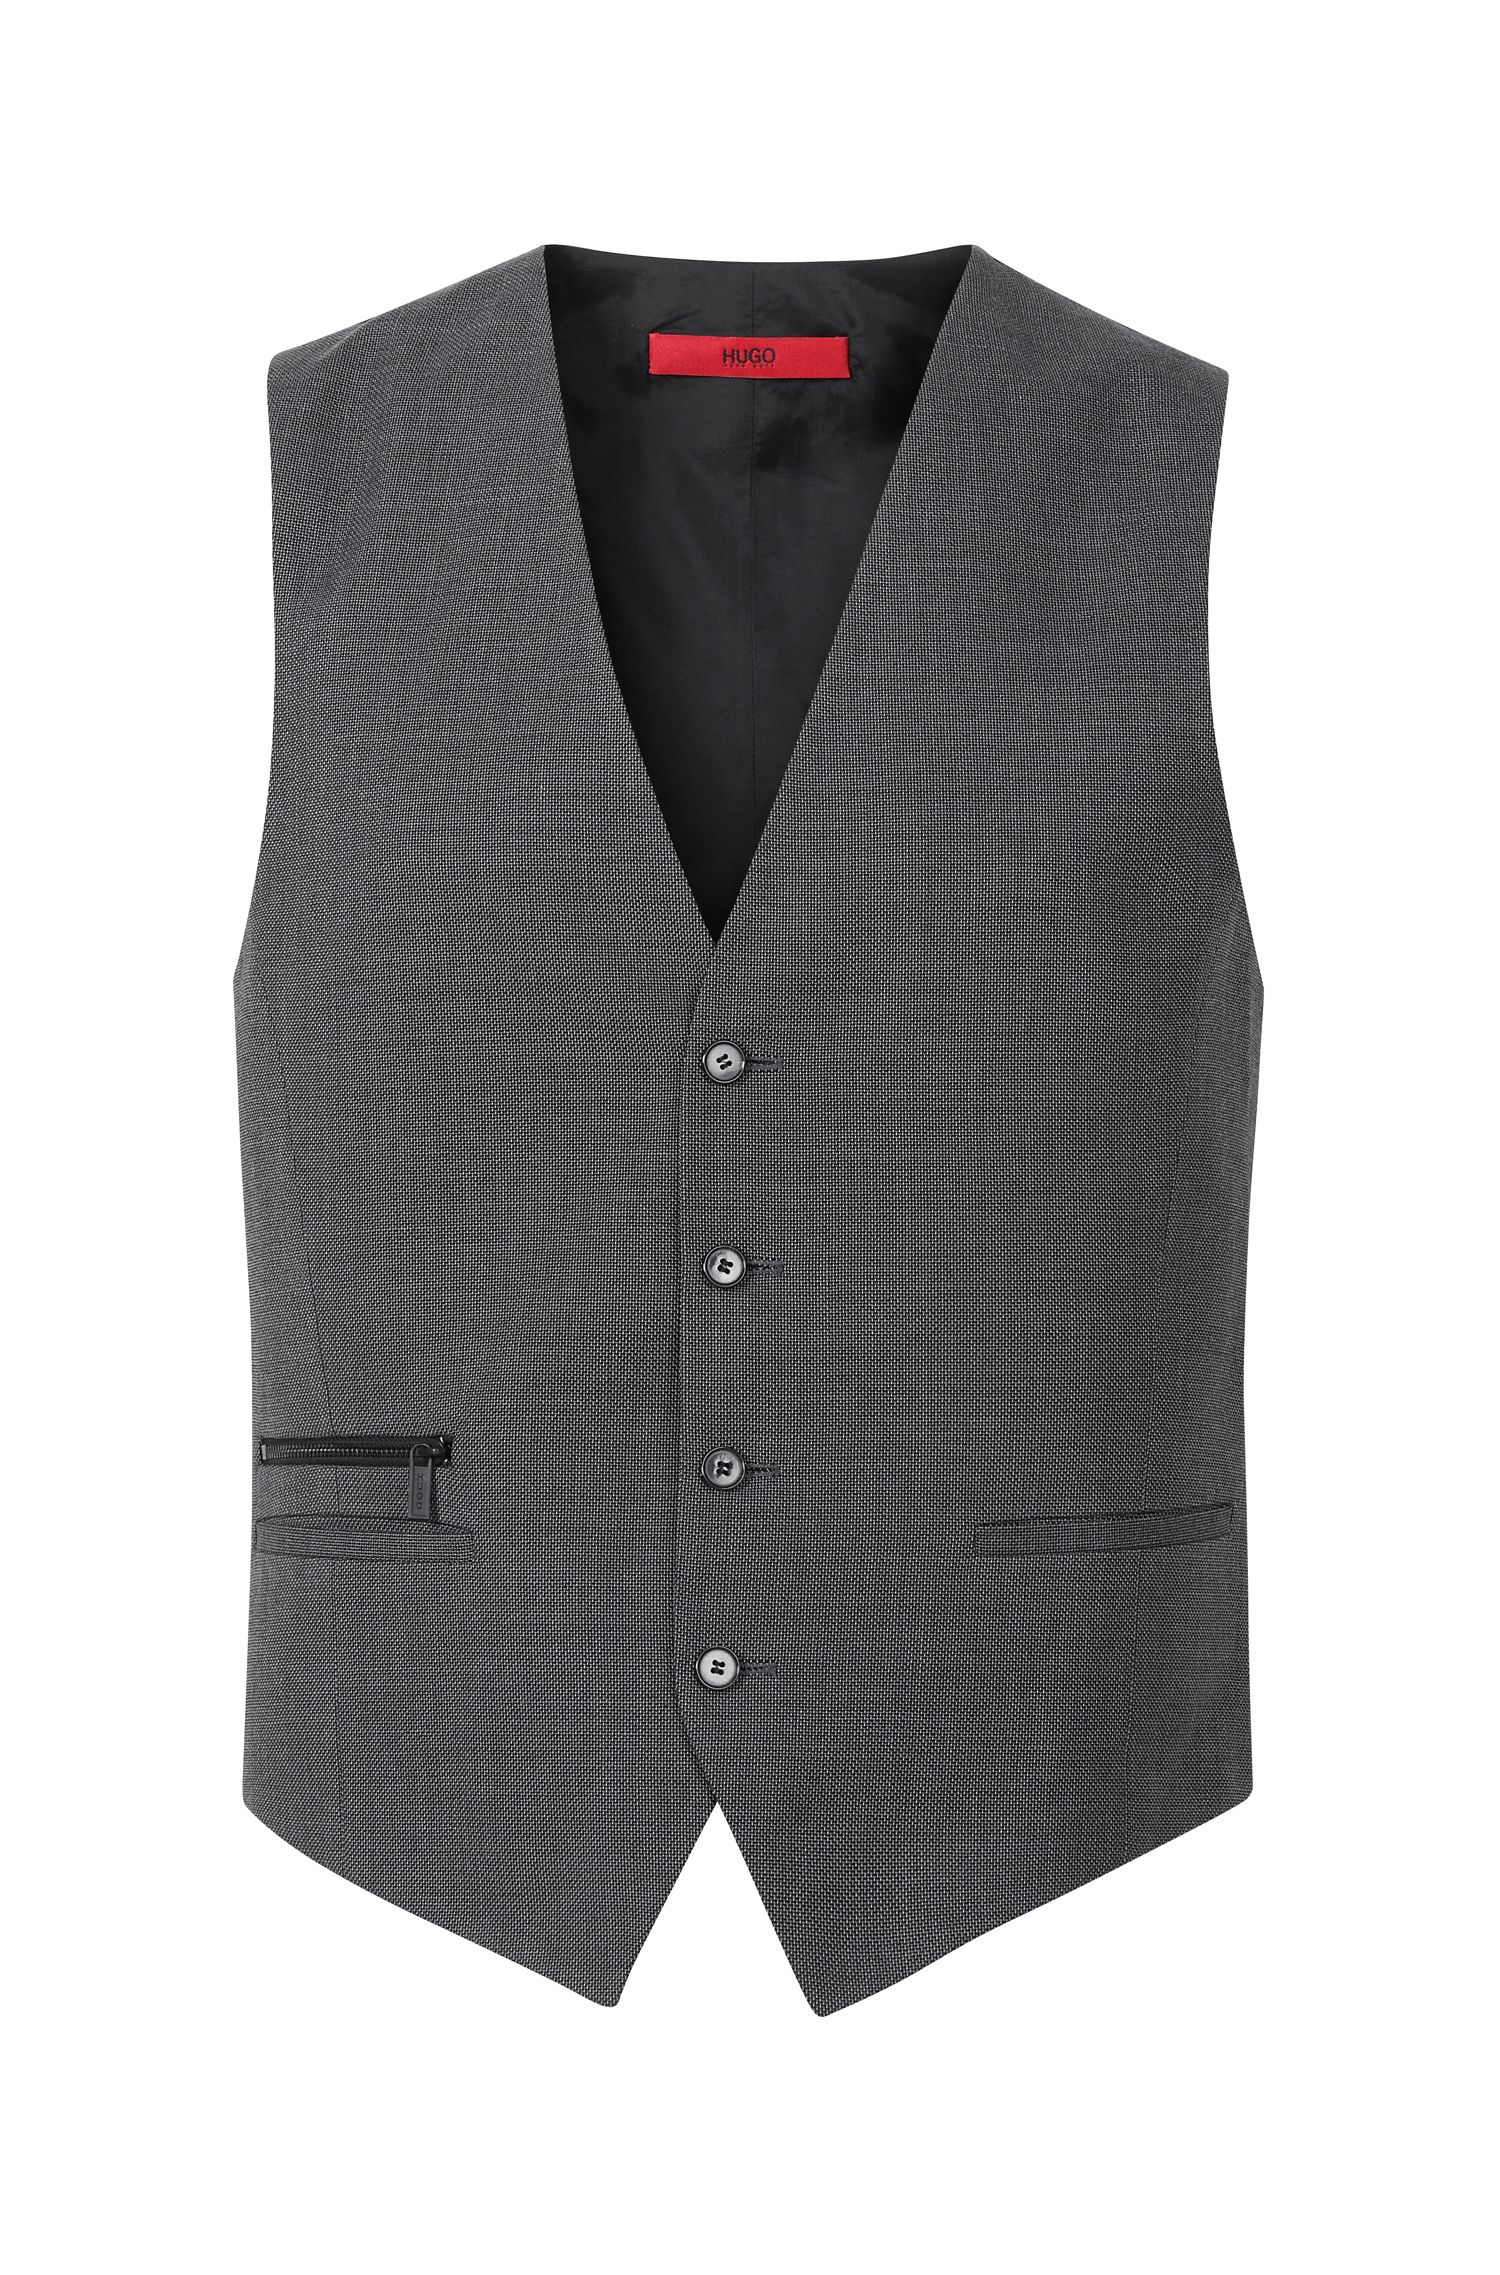 Virgin Wool Cotton Waistcoat, Slim Fit | Wadley, Charcoal